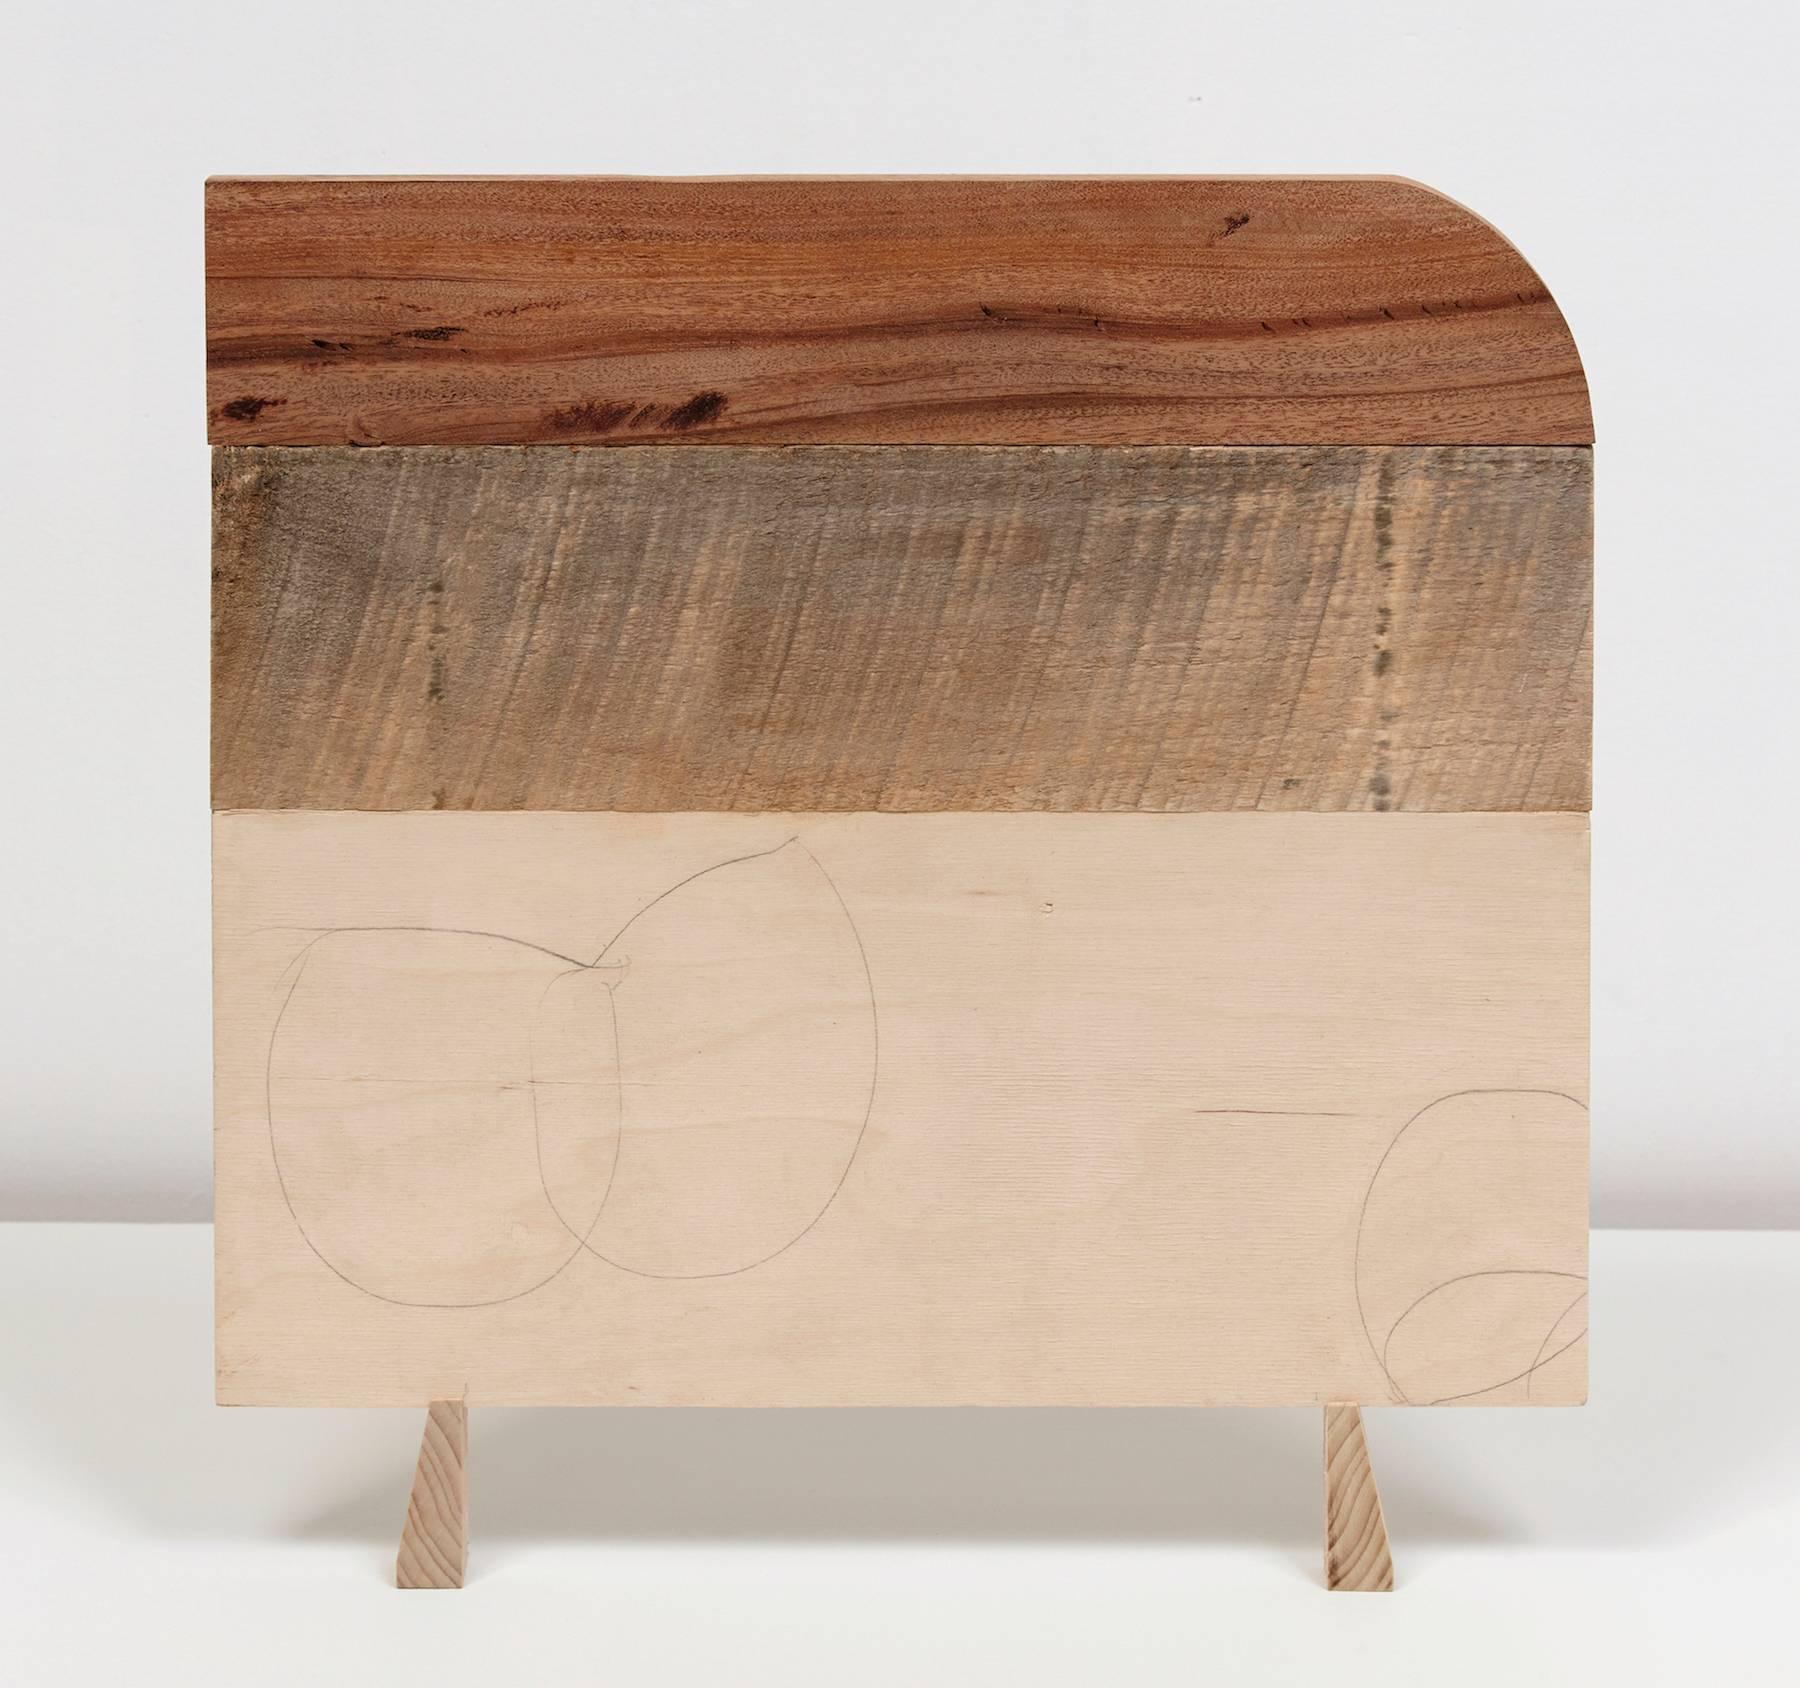 Emily Feinstein, Wood Drawing, 2016, Wood, Mahogany, Plywood